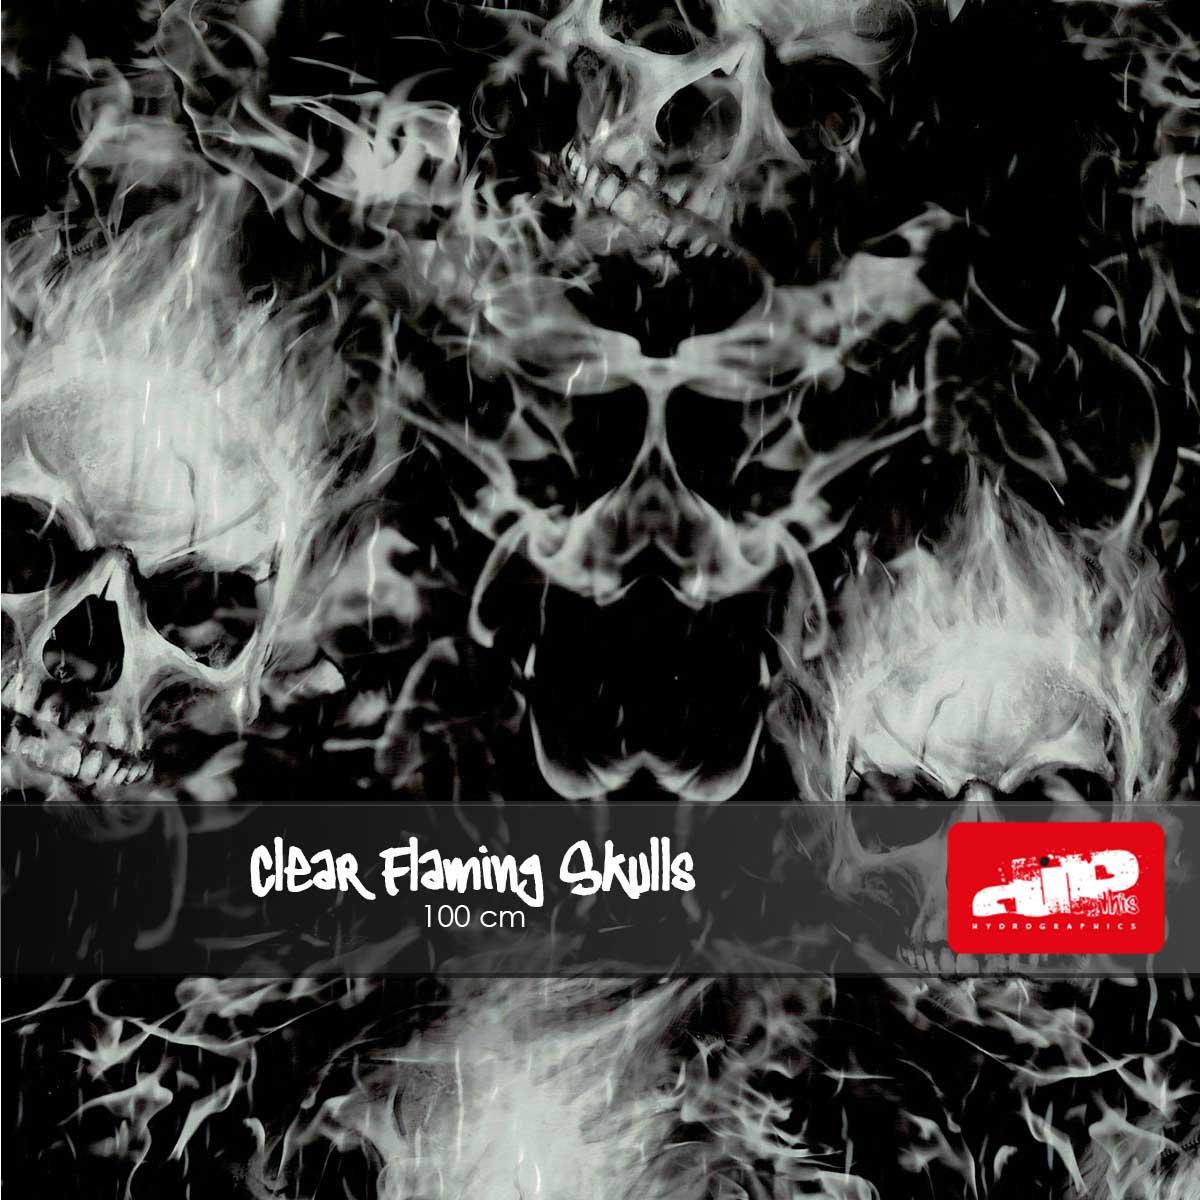 Clear Flaming Skulls